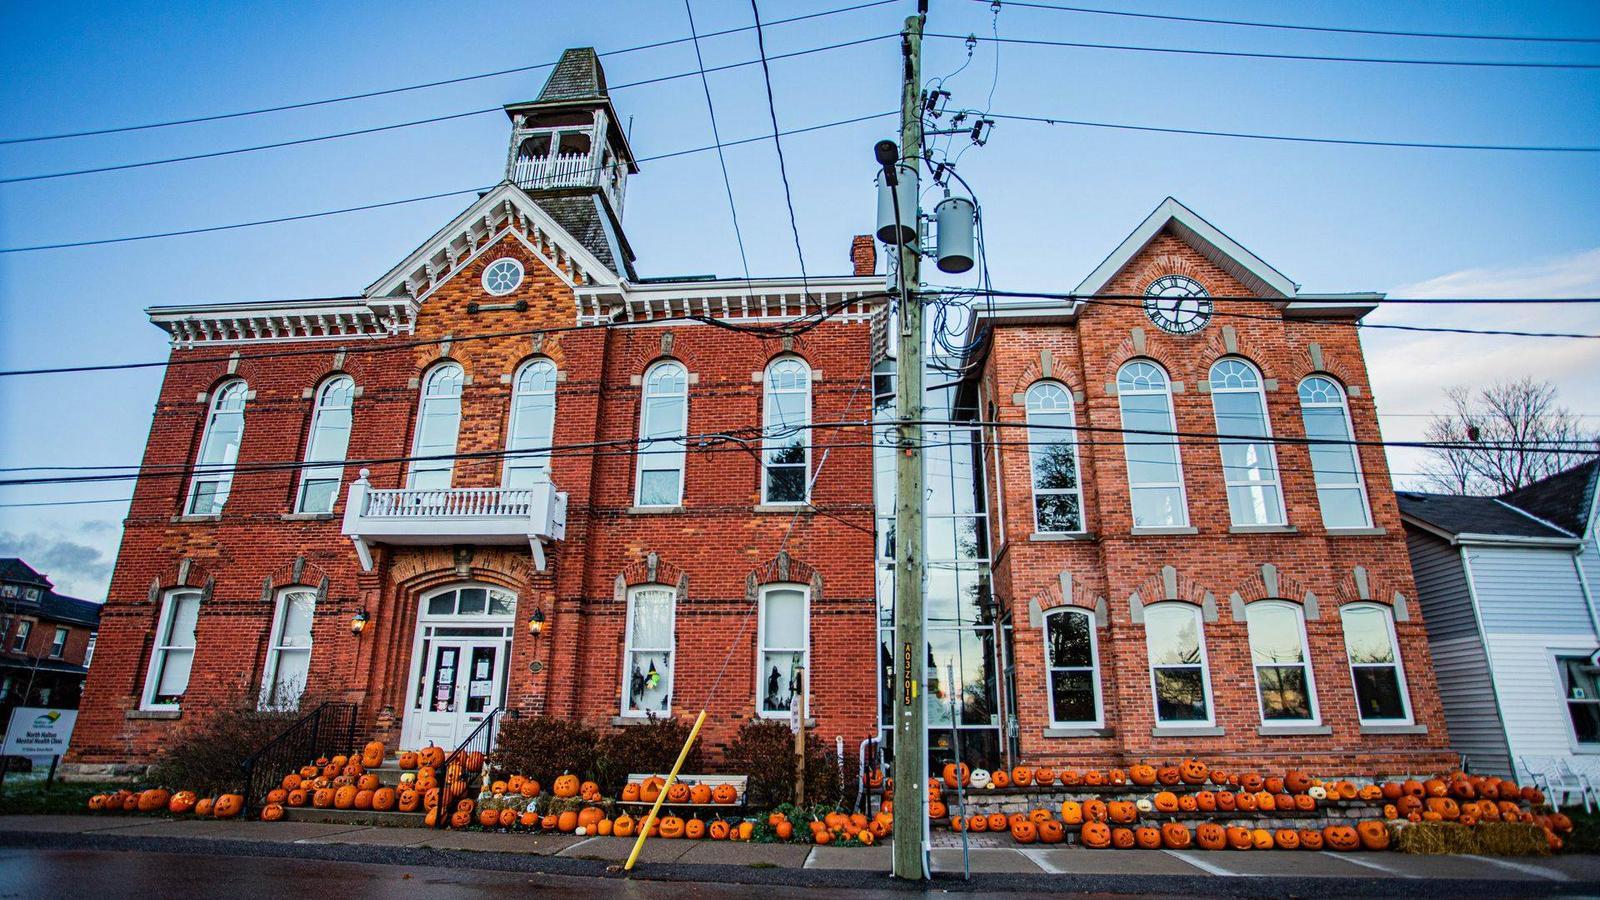 Pumpkin Promenade at Acton Town Hall